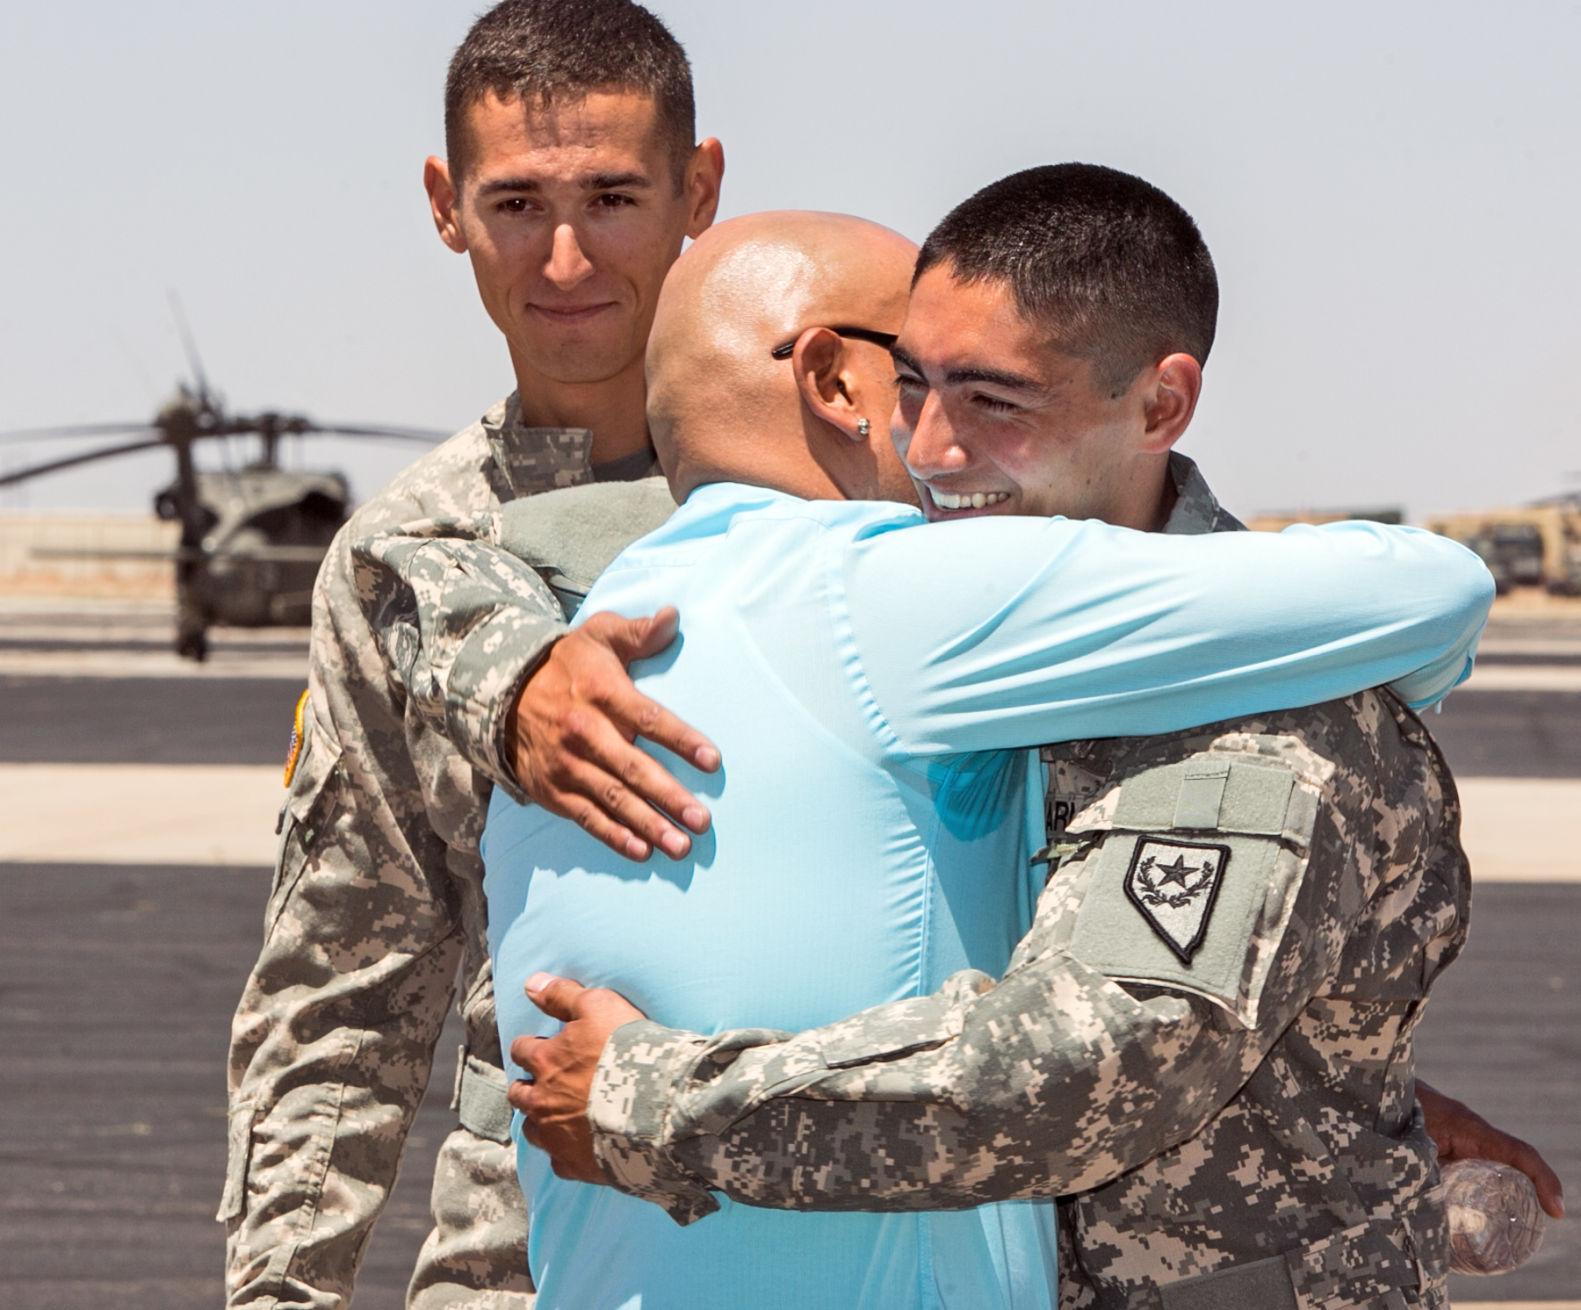 How to meet an army man